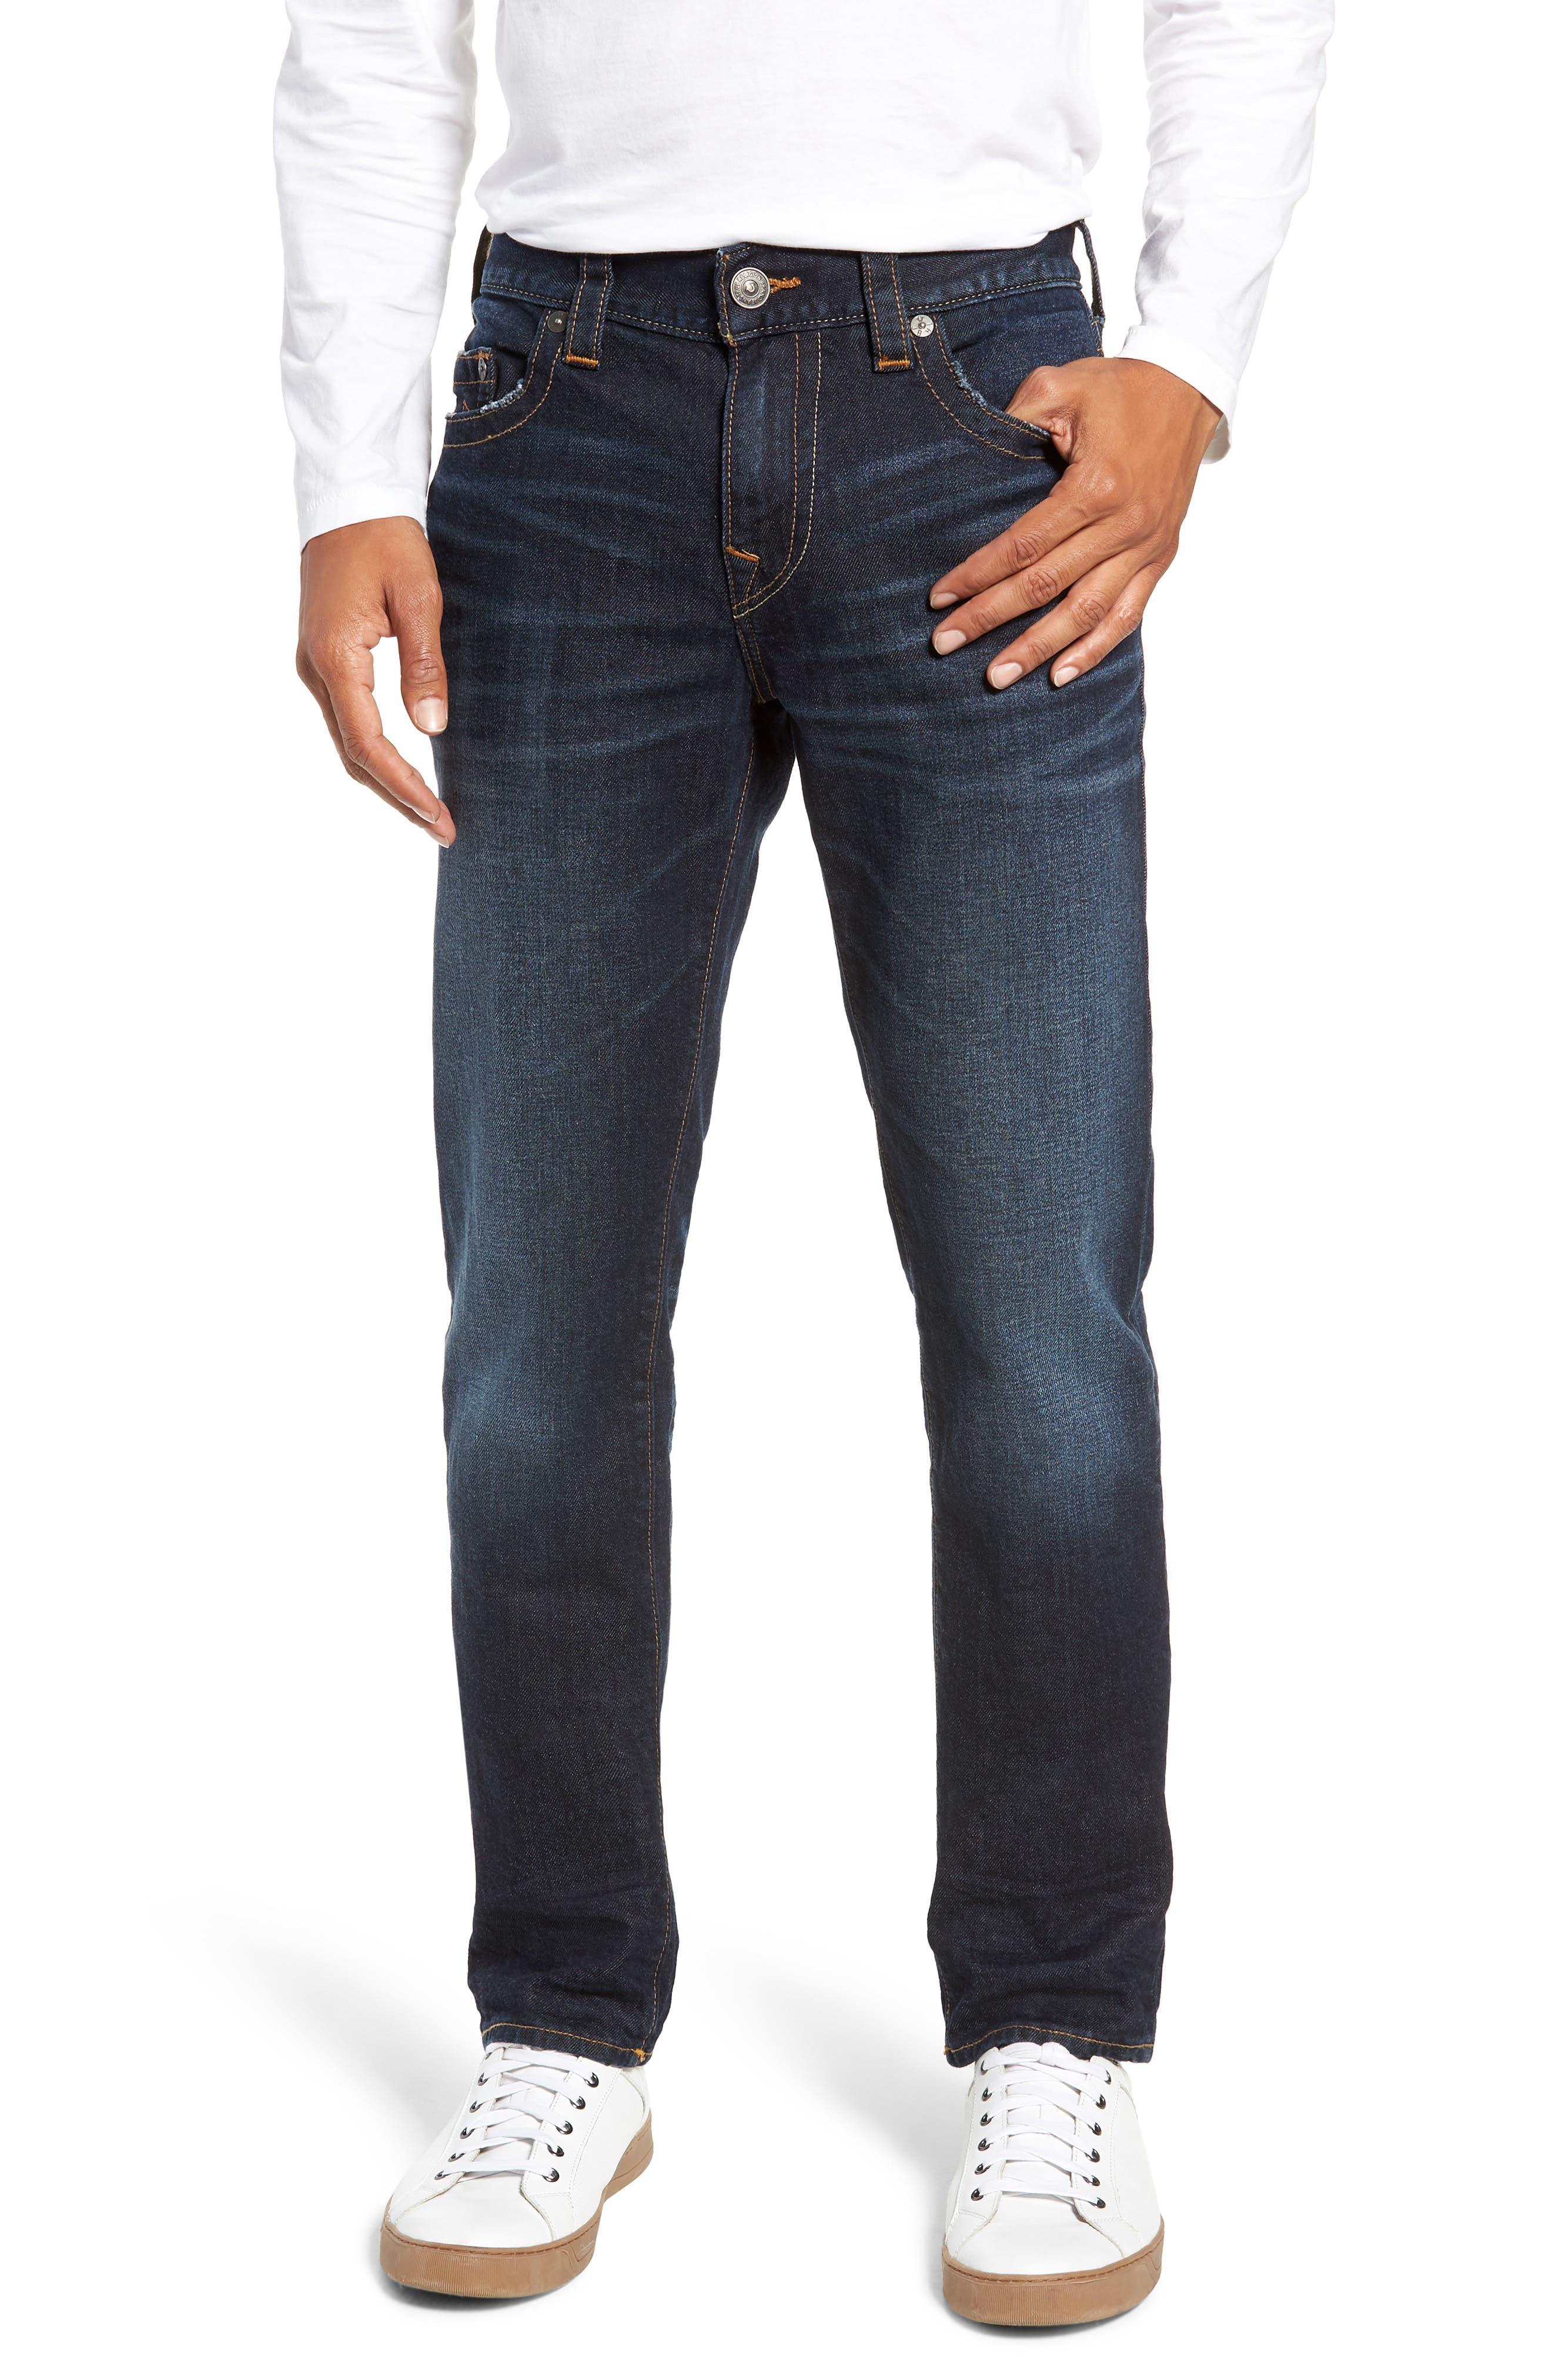 0dbfb79dc True Religion Brand Jeans Rocco Skinny Fit Jeans